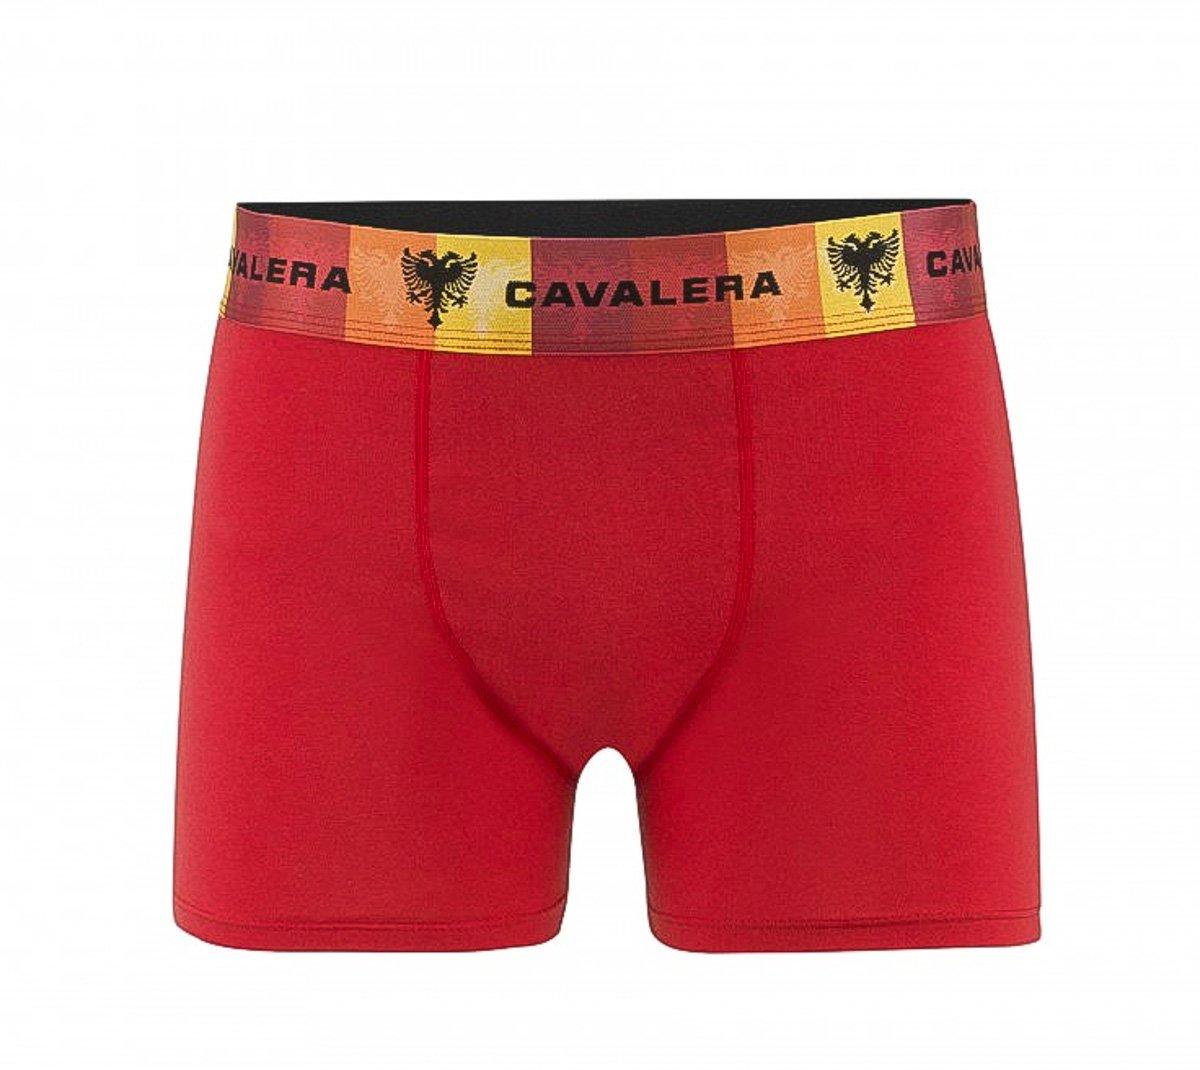 317780952e5c86 Cueca Boxer Masculina Cavalera Joe Qe5494